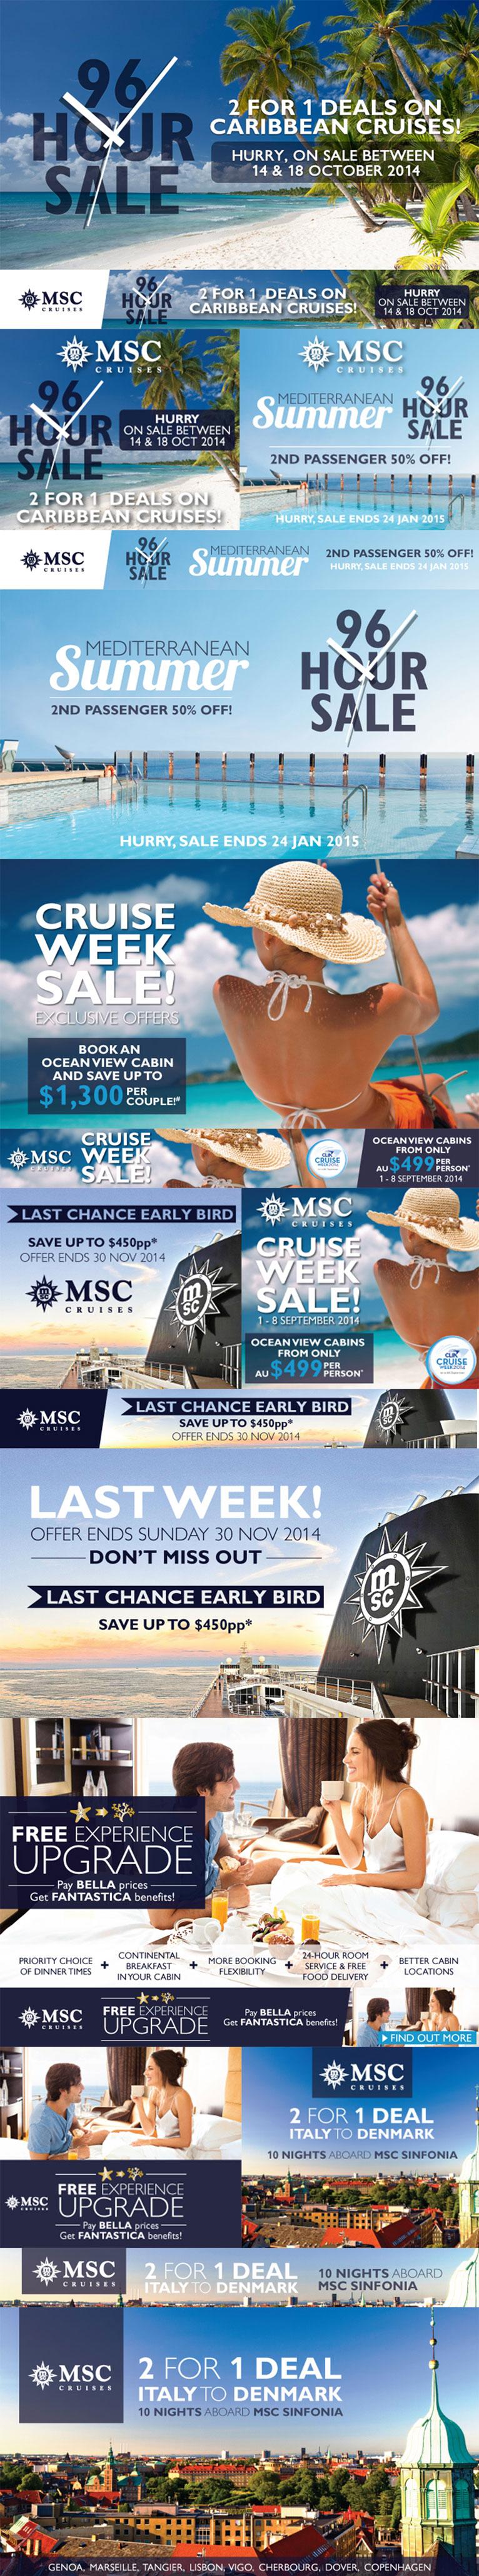 msc-web-banners